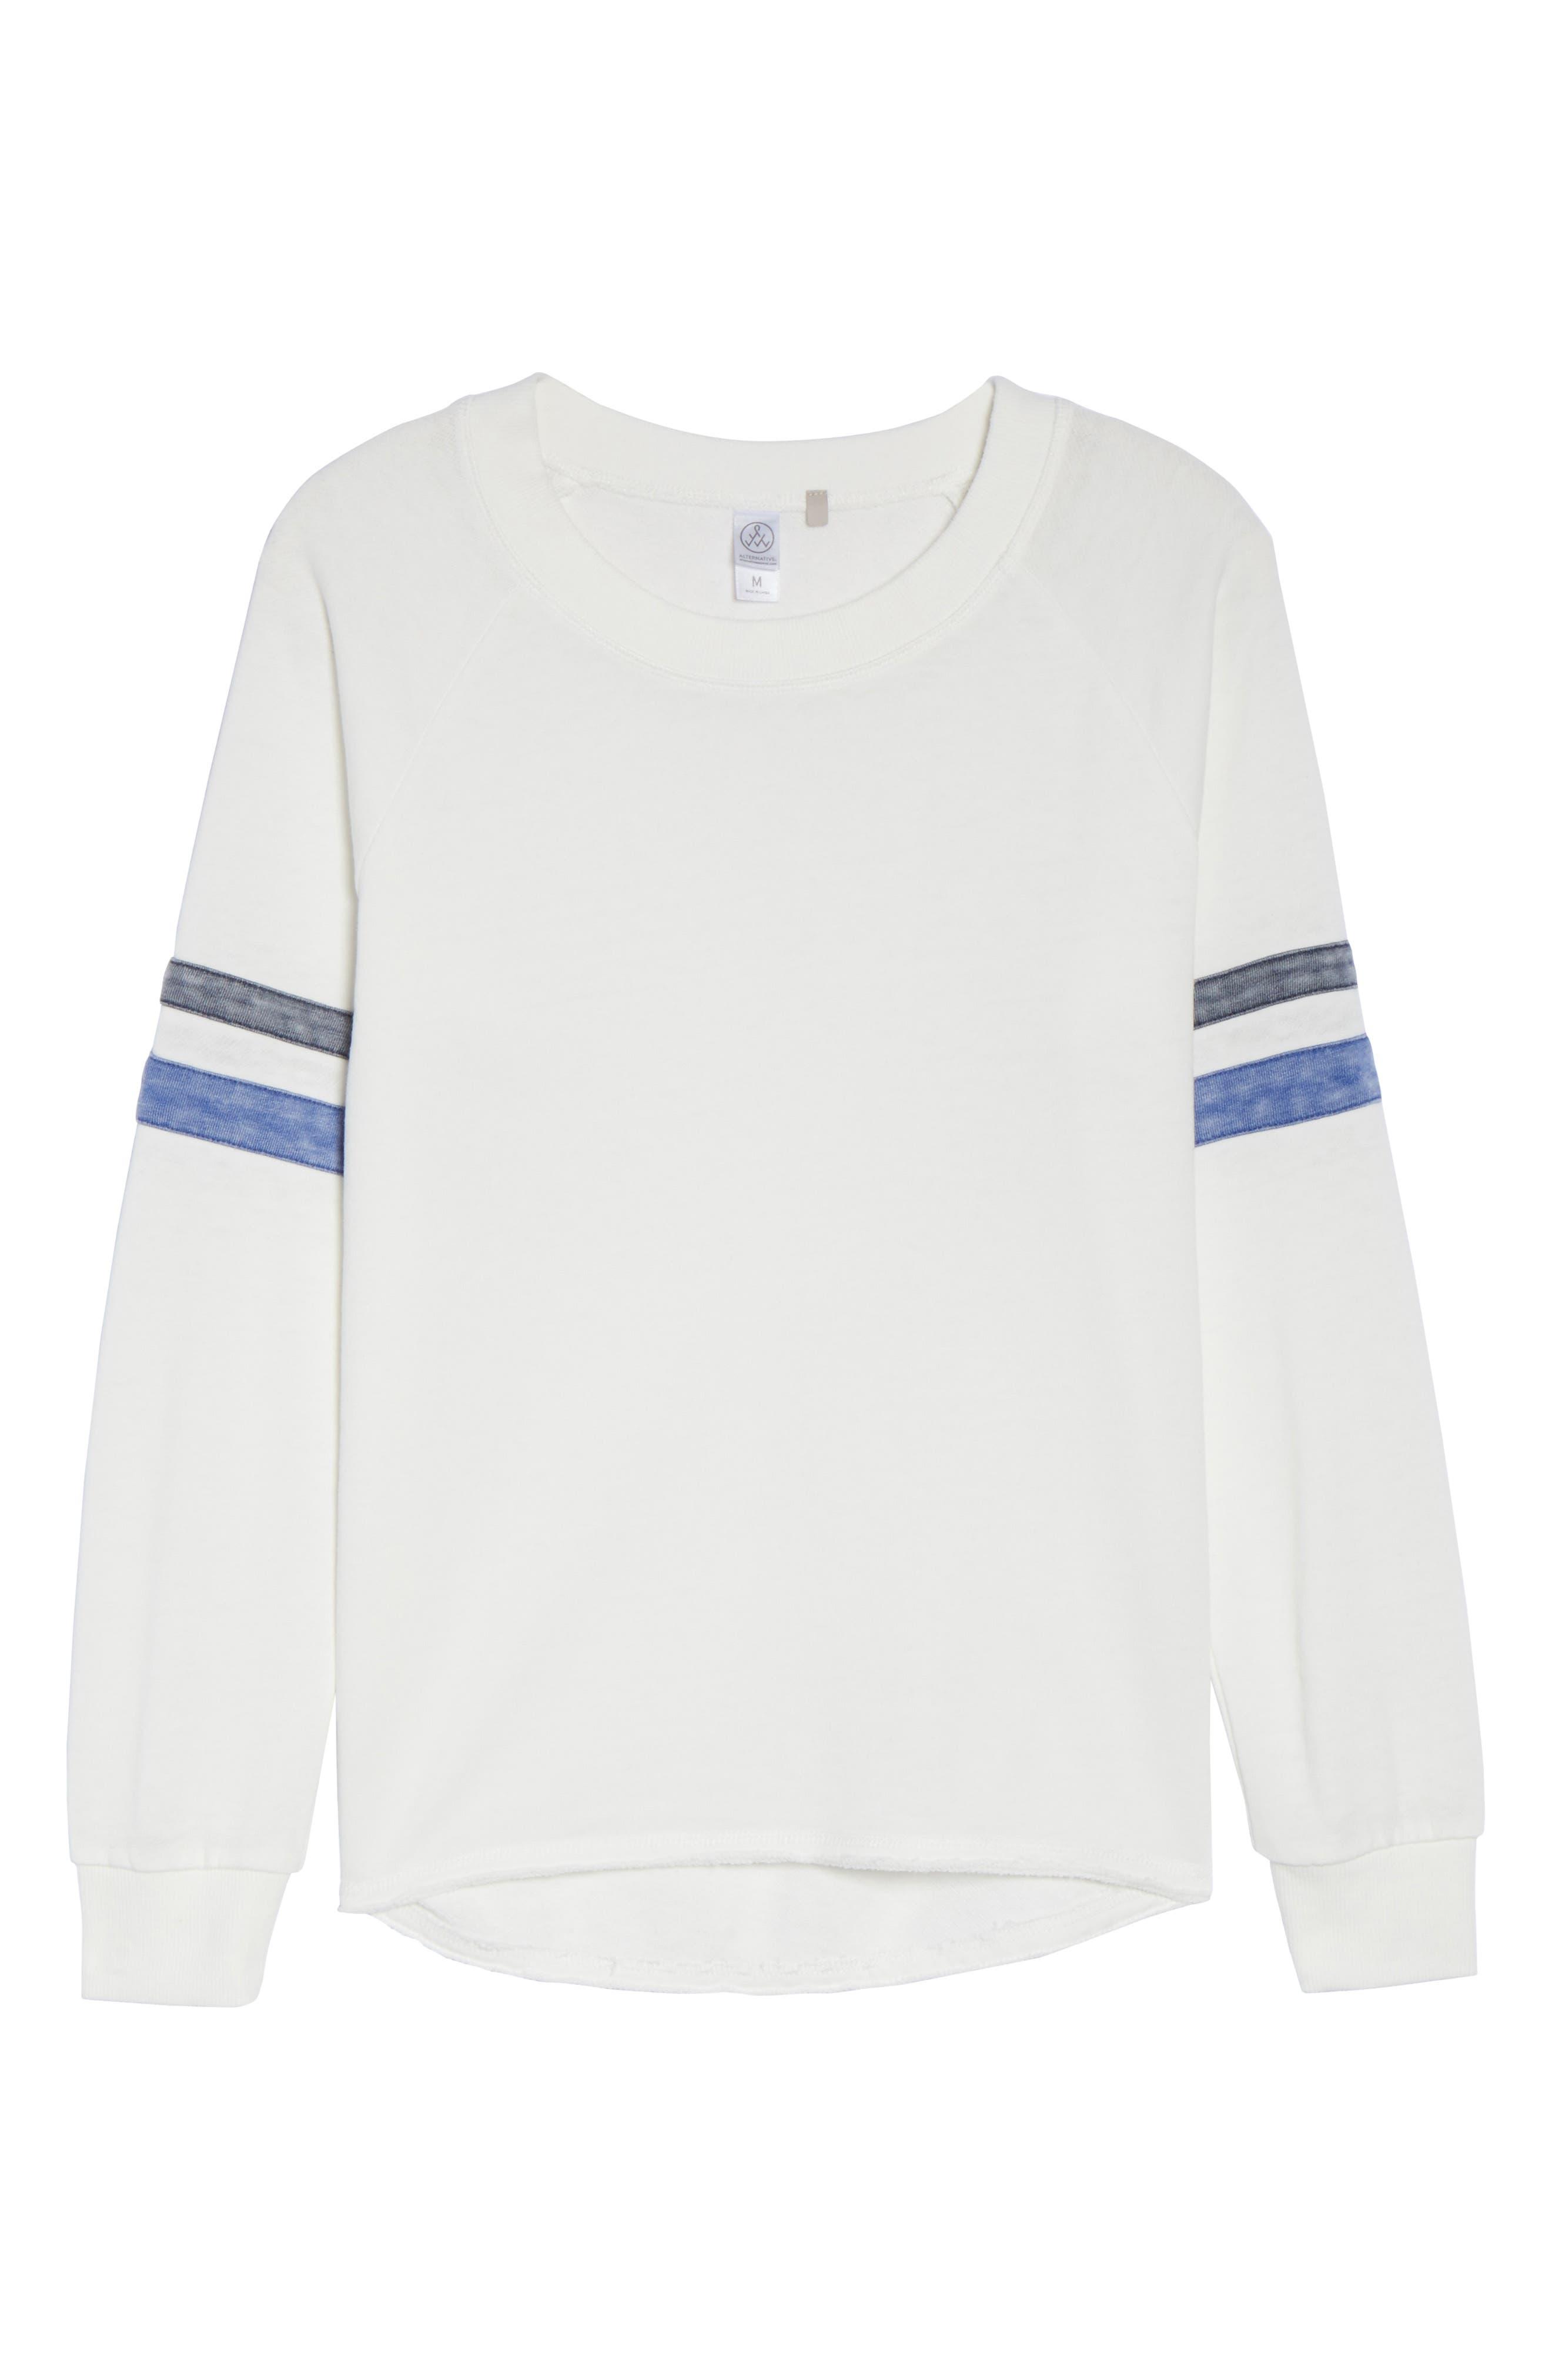 Lazy Day Sweatshirt,                             Alternate thumbnail 5, color,                             Ivory/ Dark Navy/ Pacific Blue